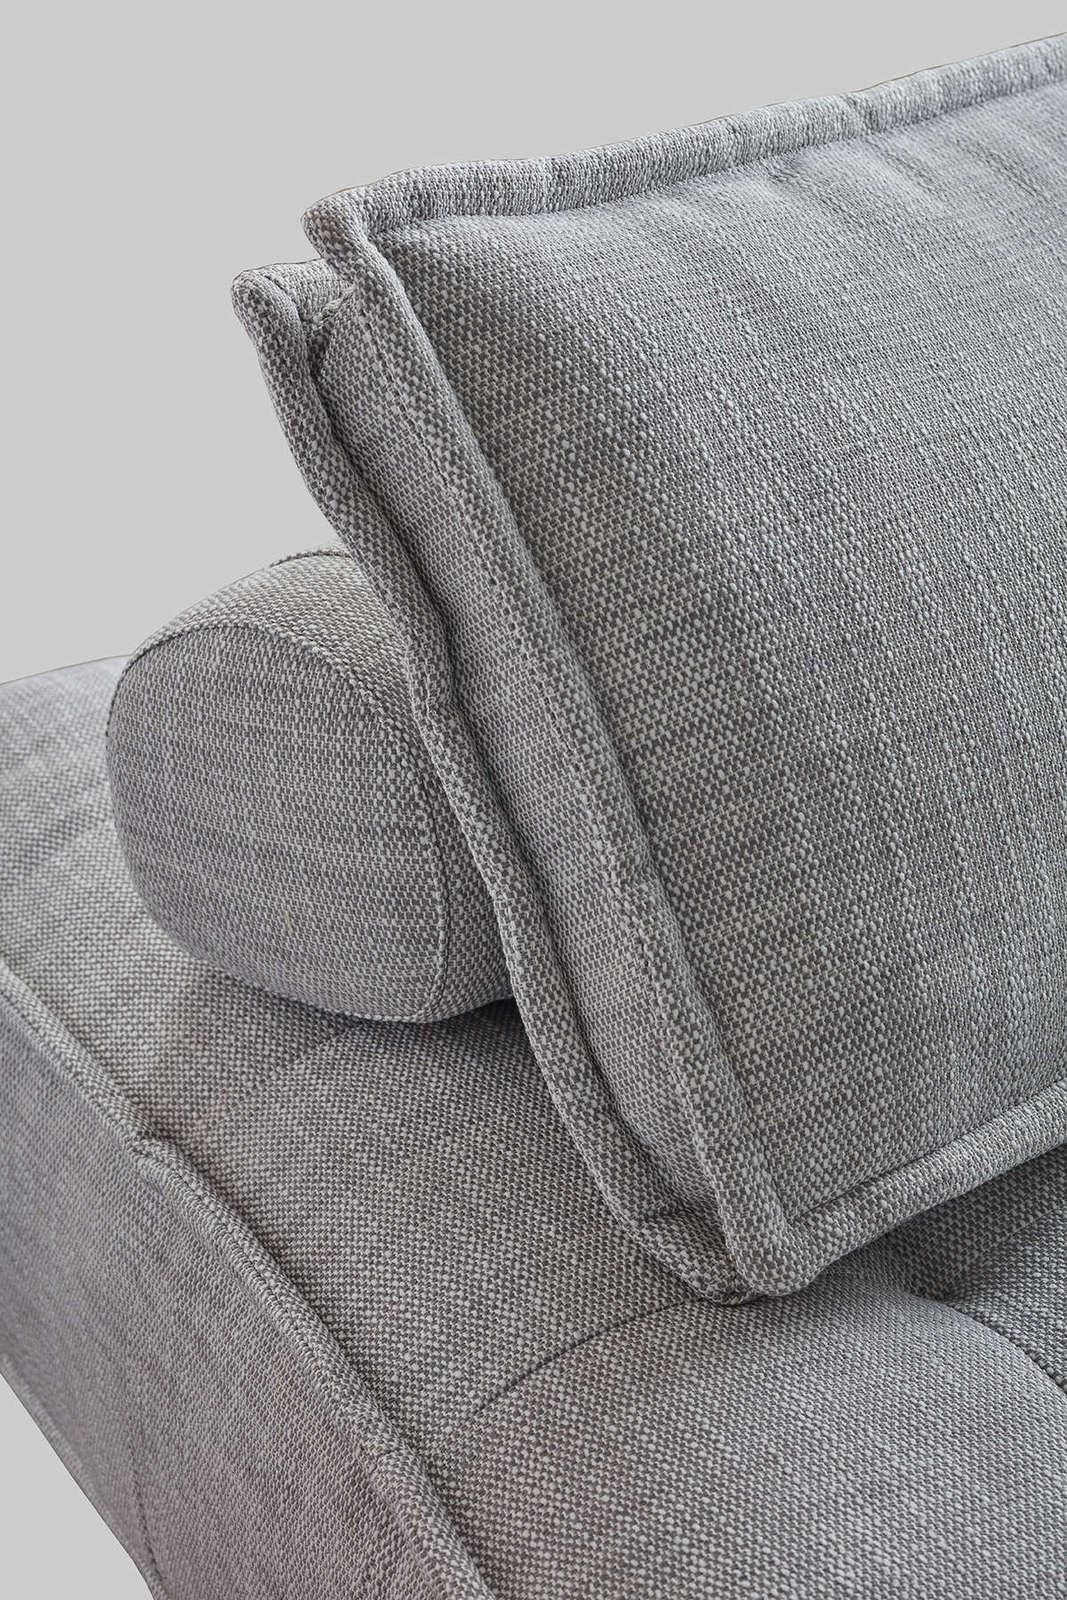 Casper Armchair Grey 2